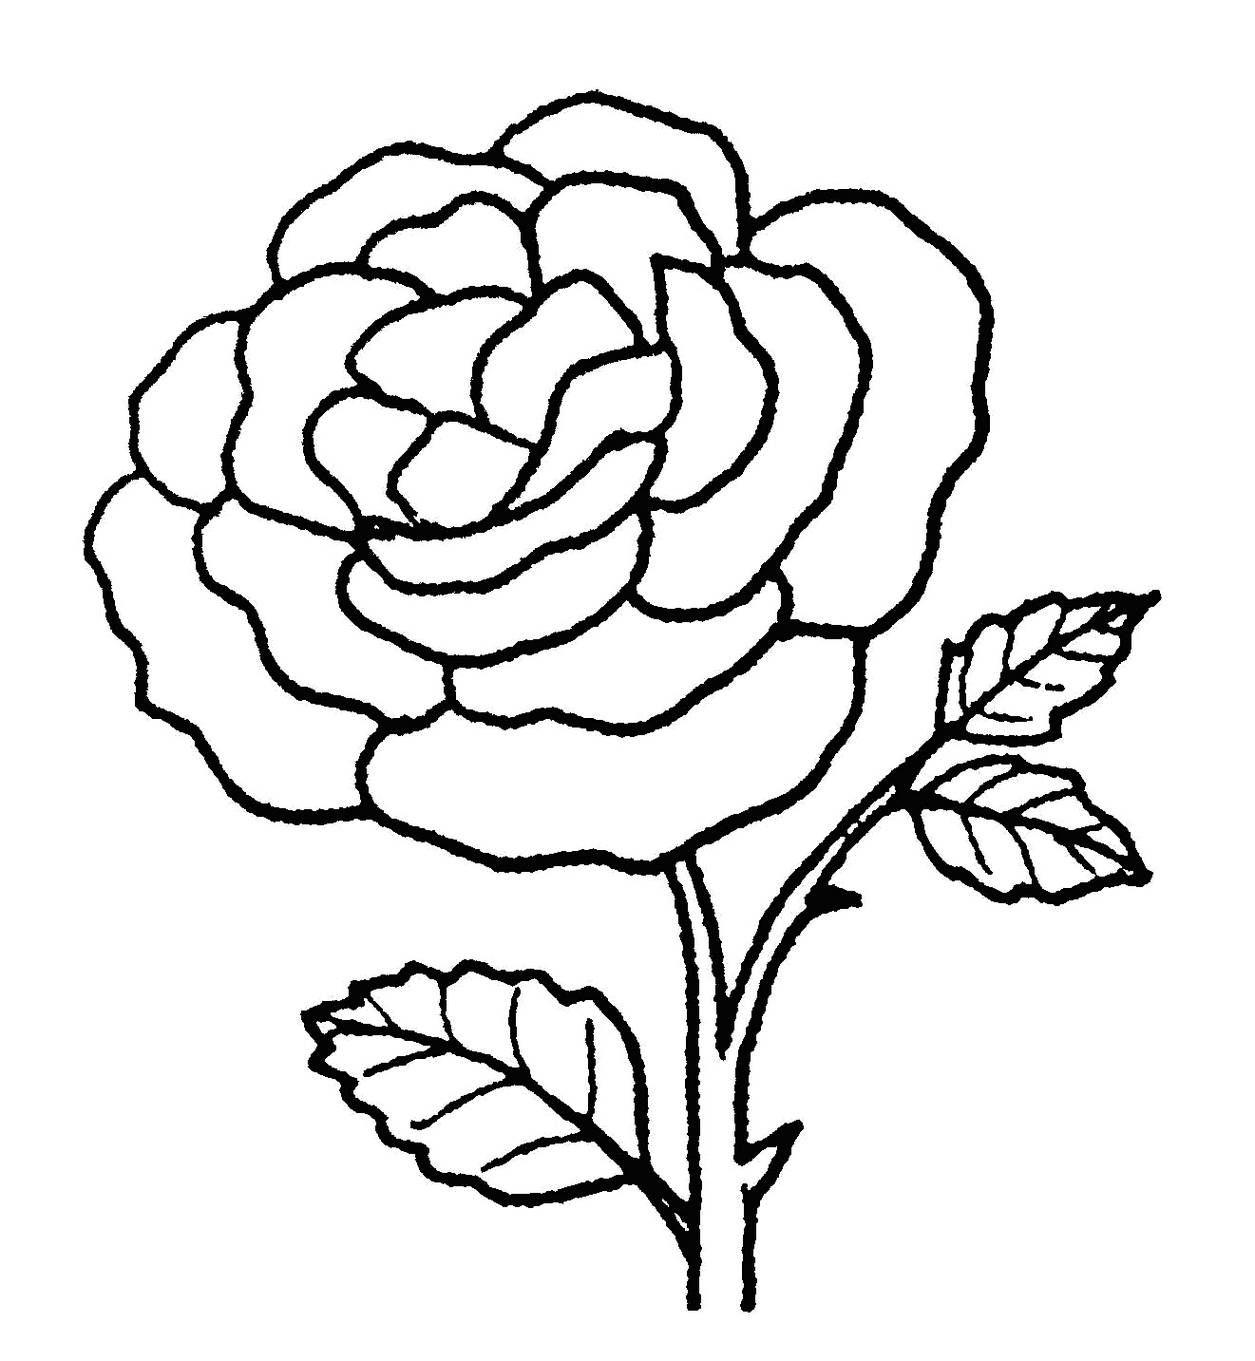 Gambar Bunga Cempaka Sketsa Sketsa Bunga Bunga Sketsa